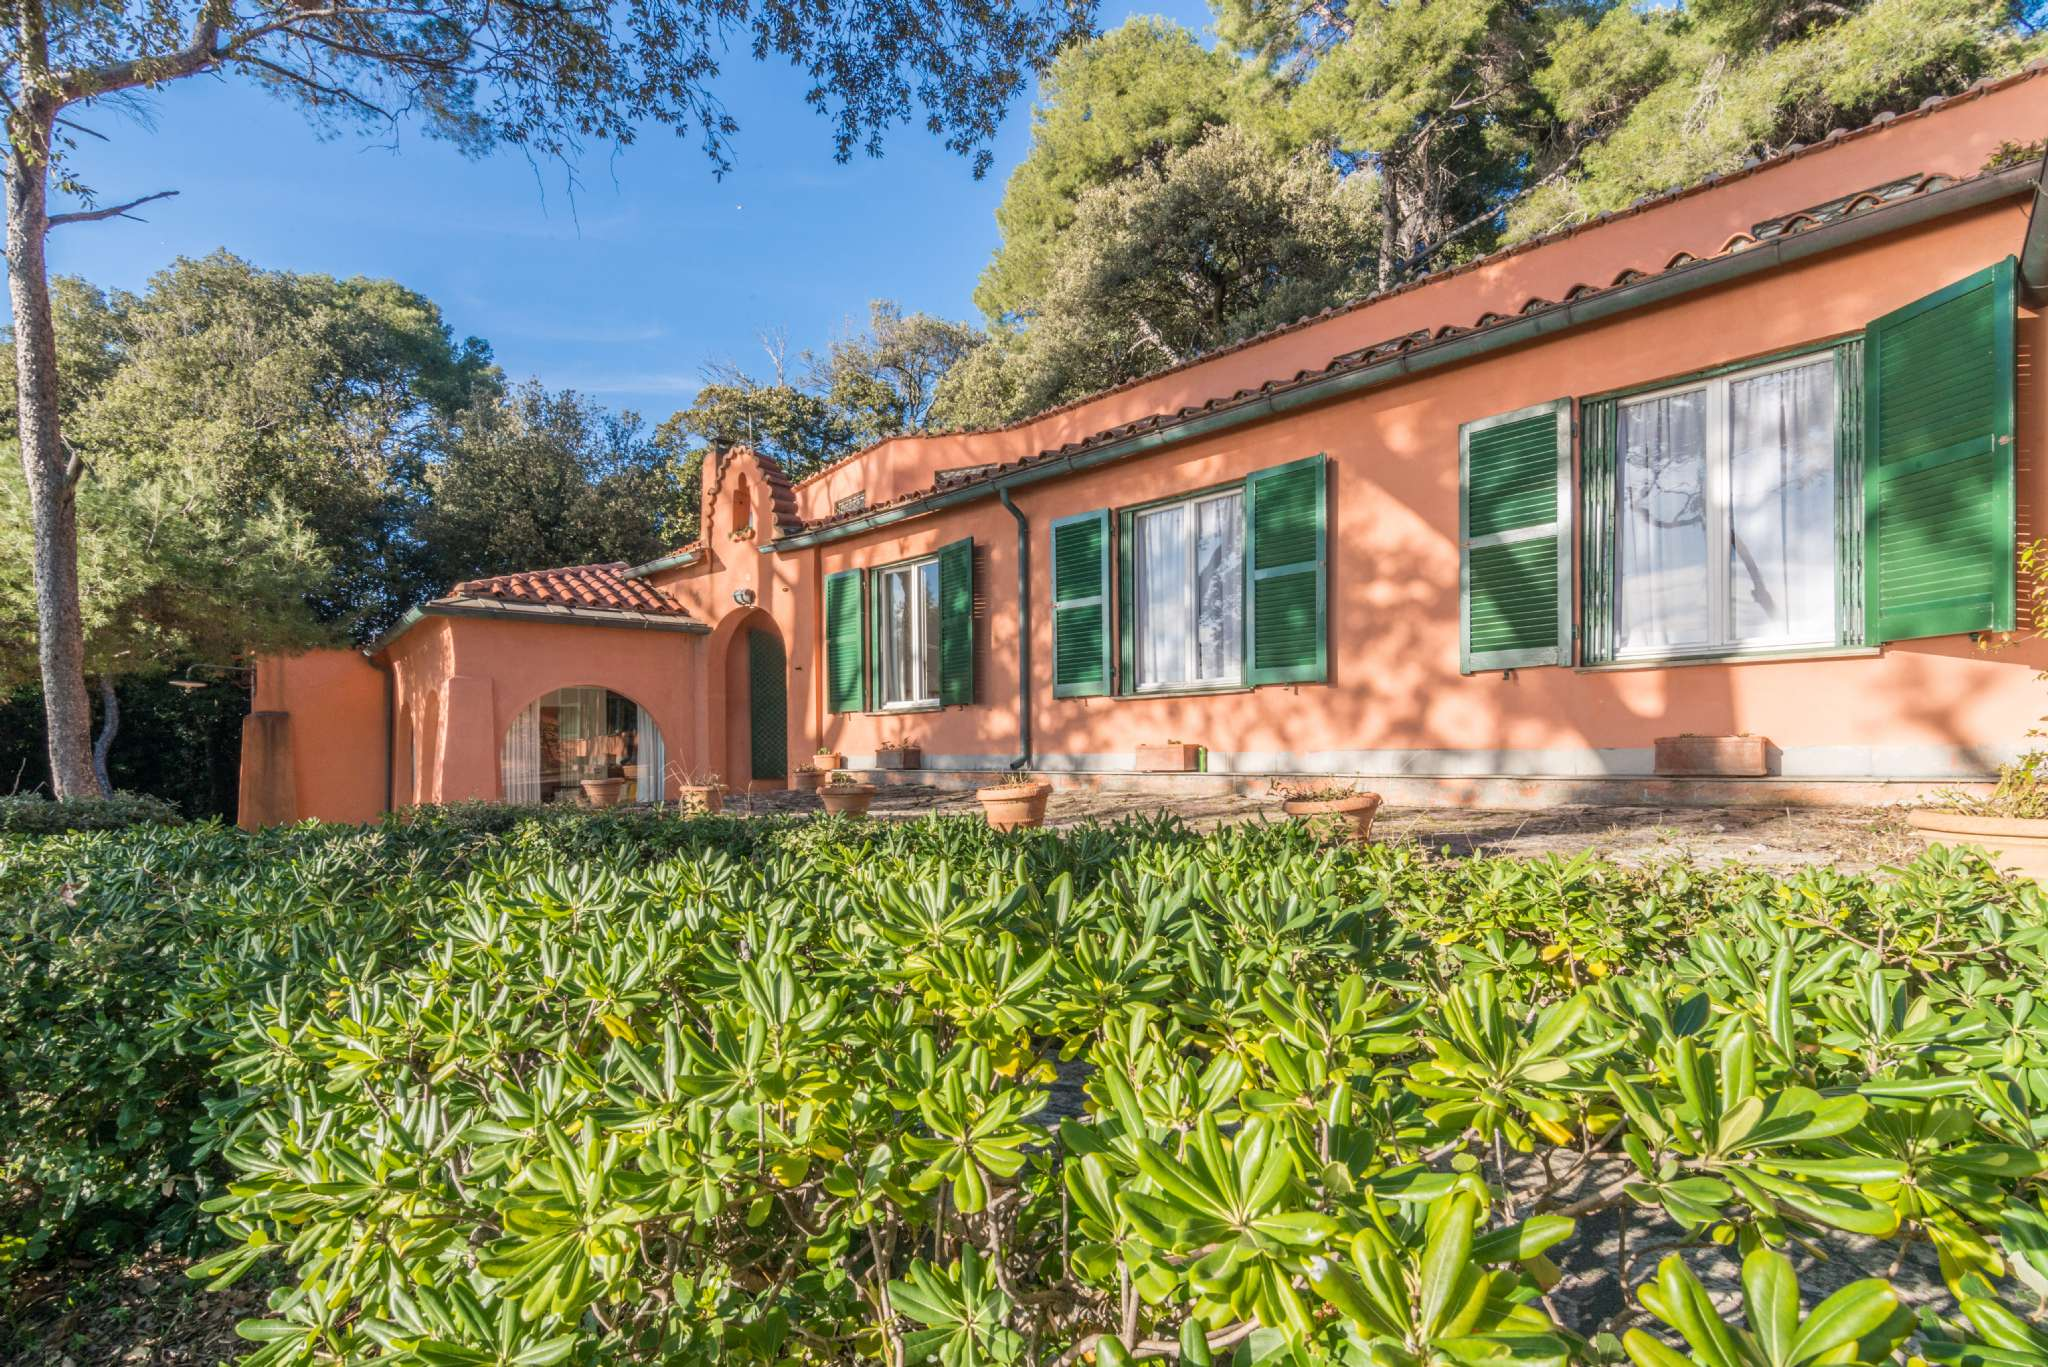 Villa in Vendita a Lerici: 5 locali, 340 mq - Foto 6